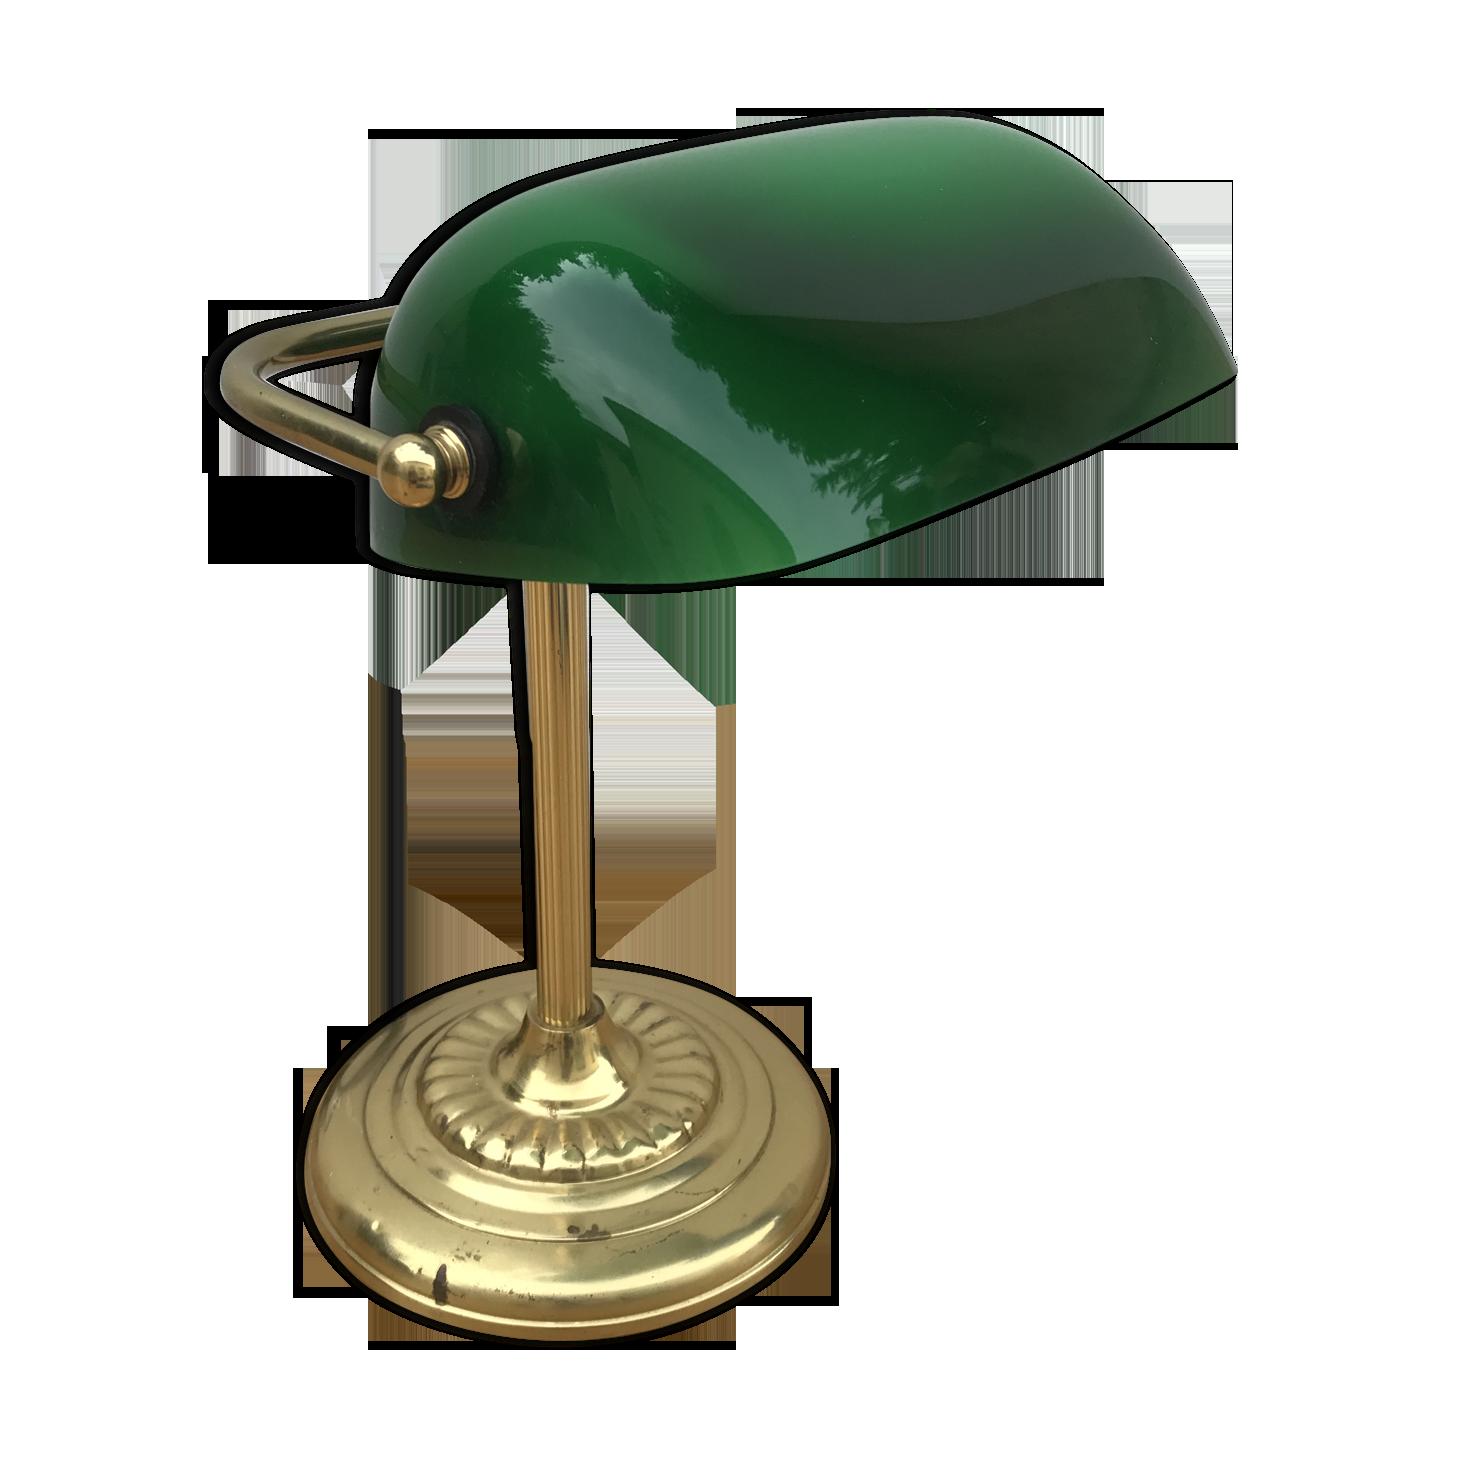 Les Banquiers Lampe Lampe De Table Lampe De Bureau Burolampe Art